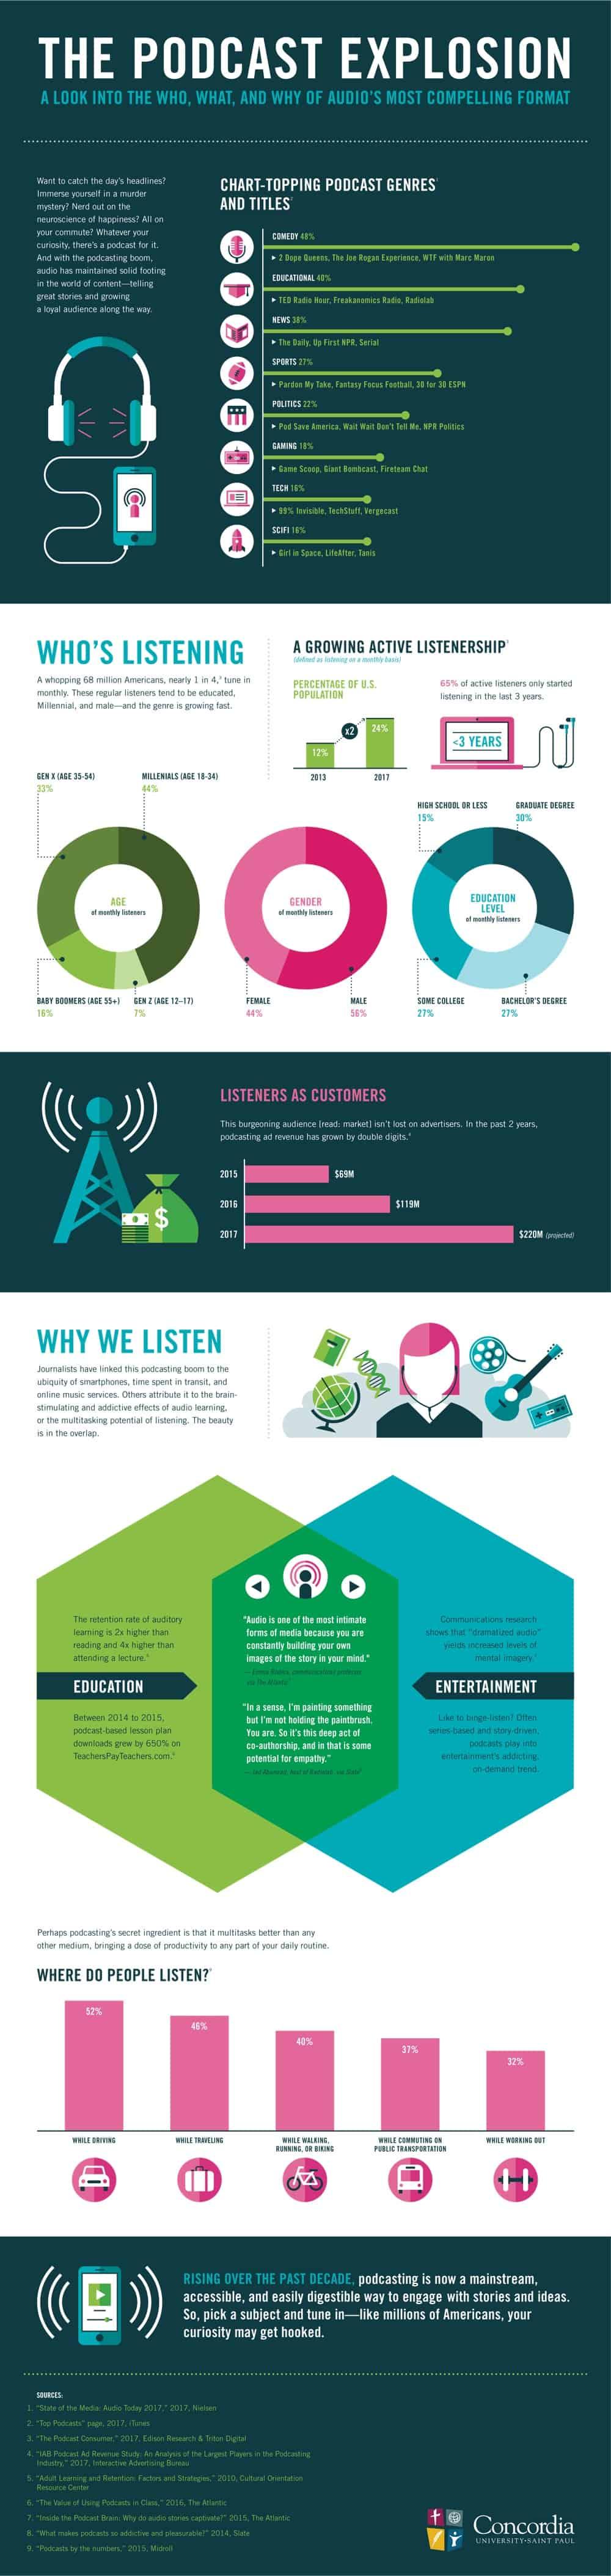 todo-sobre-el-uso-del-podcasting-infografia